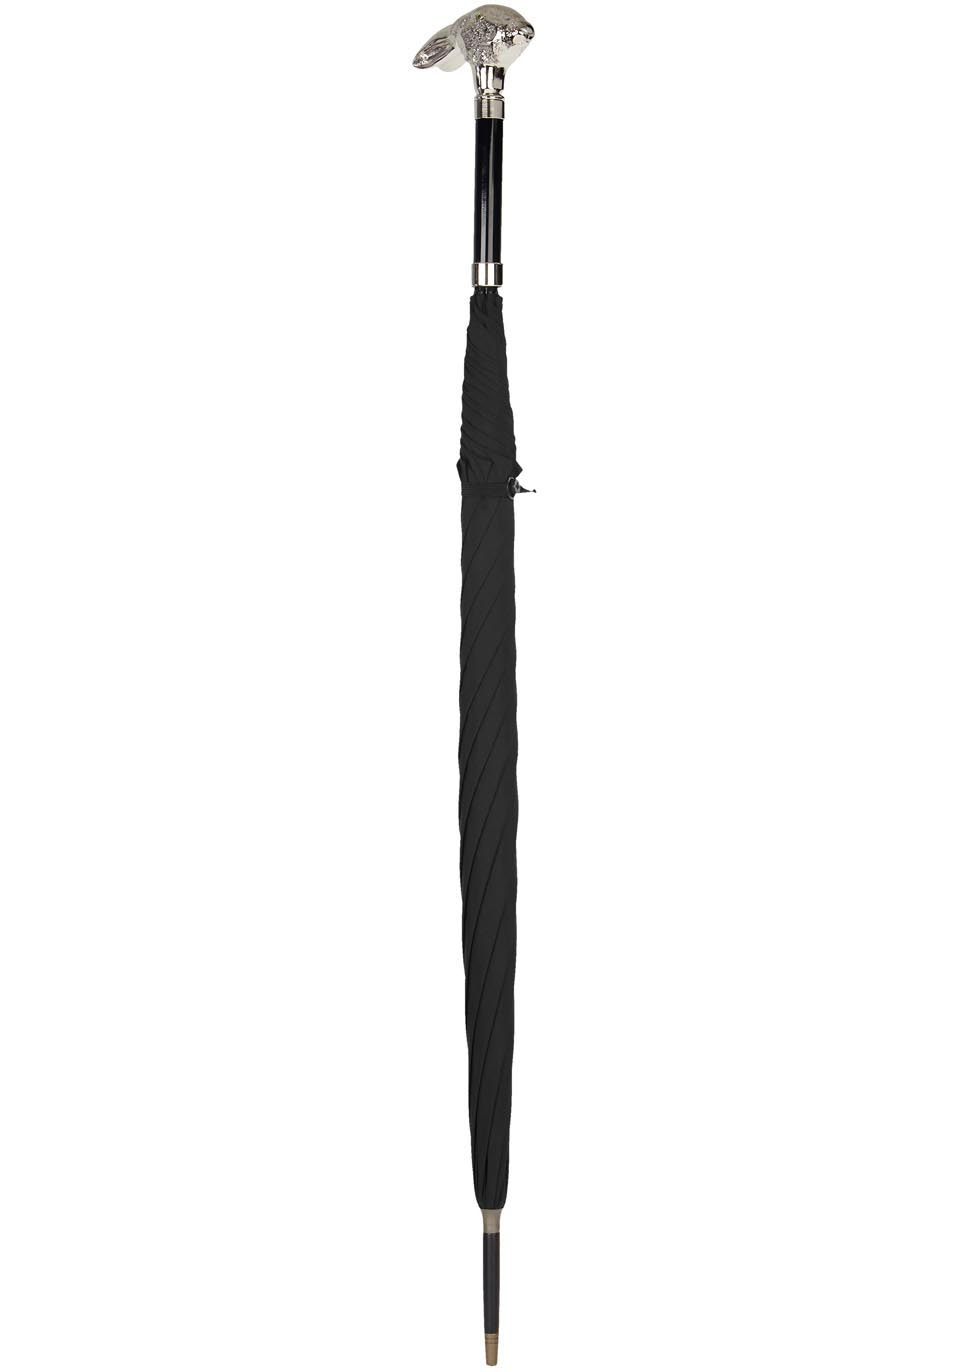 Rabbit-handle black umbrella - Fox Umbrellas